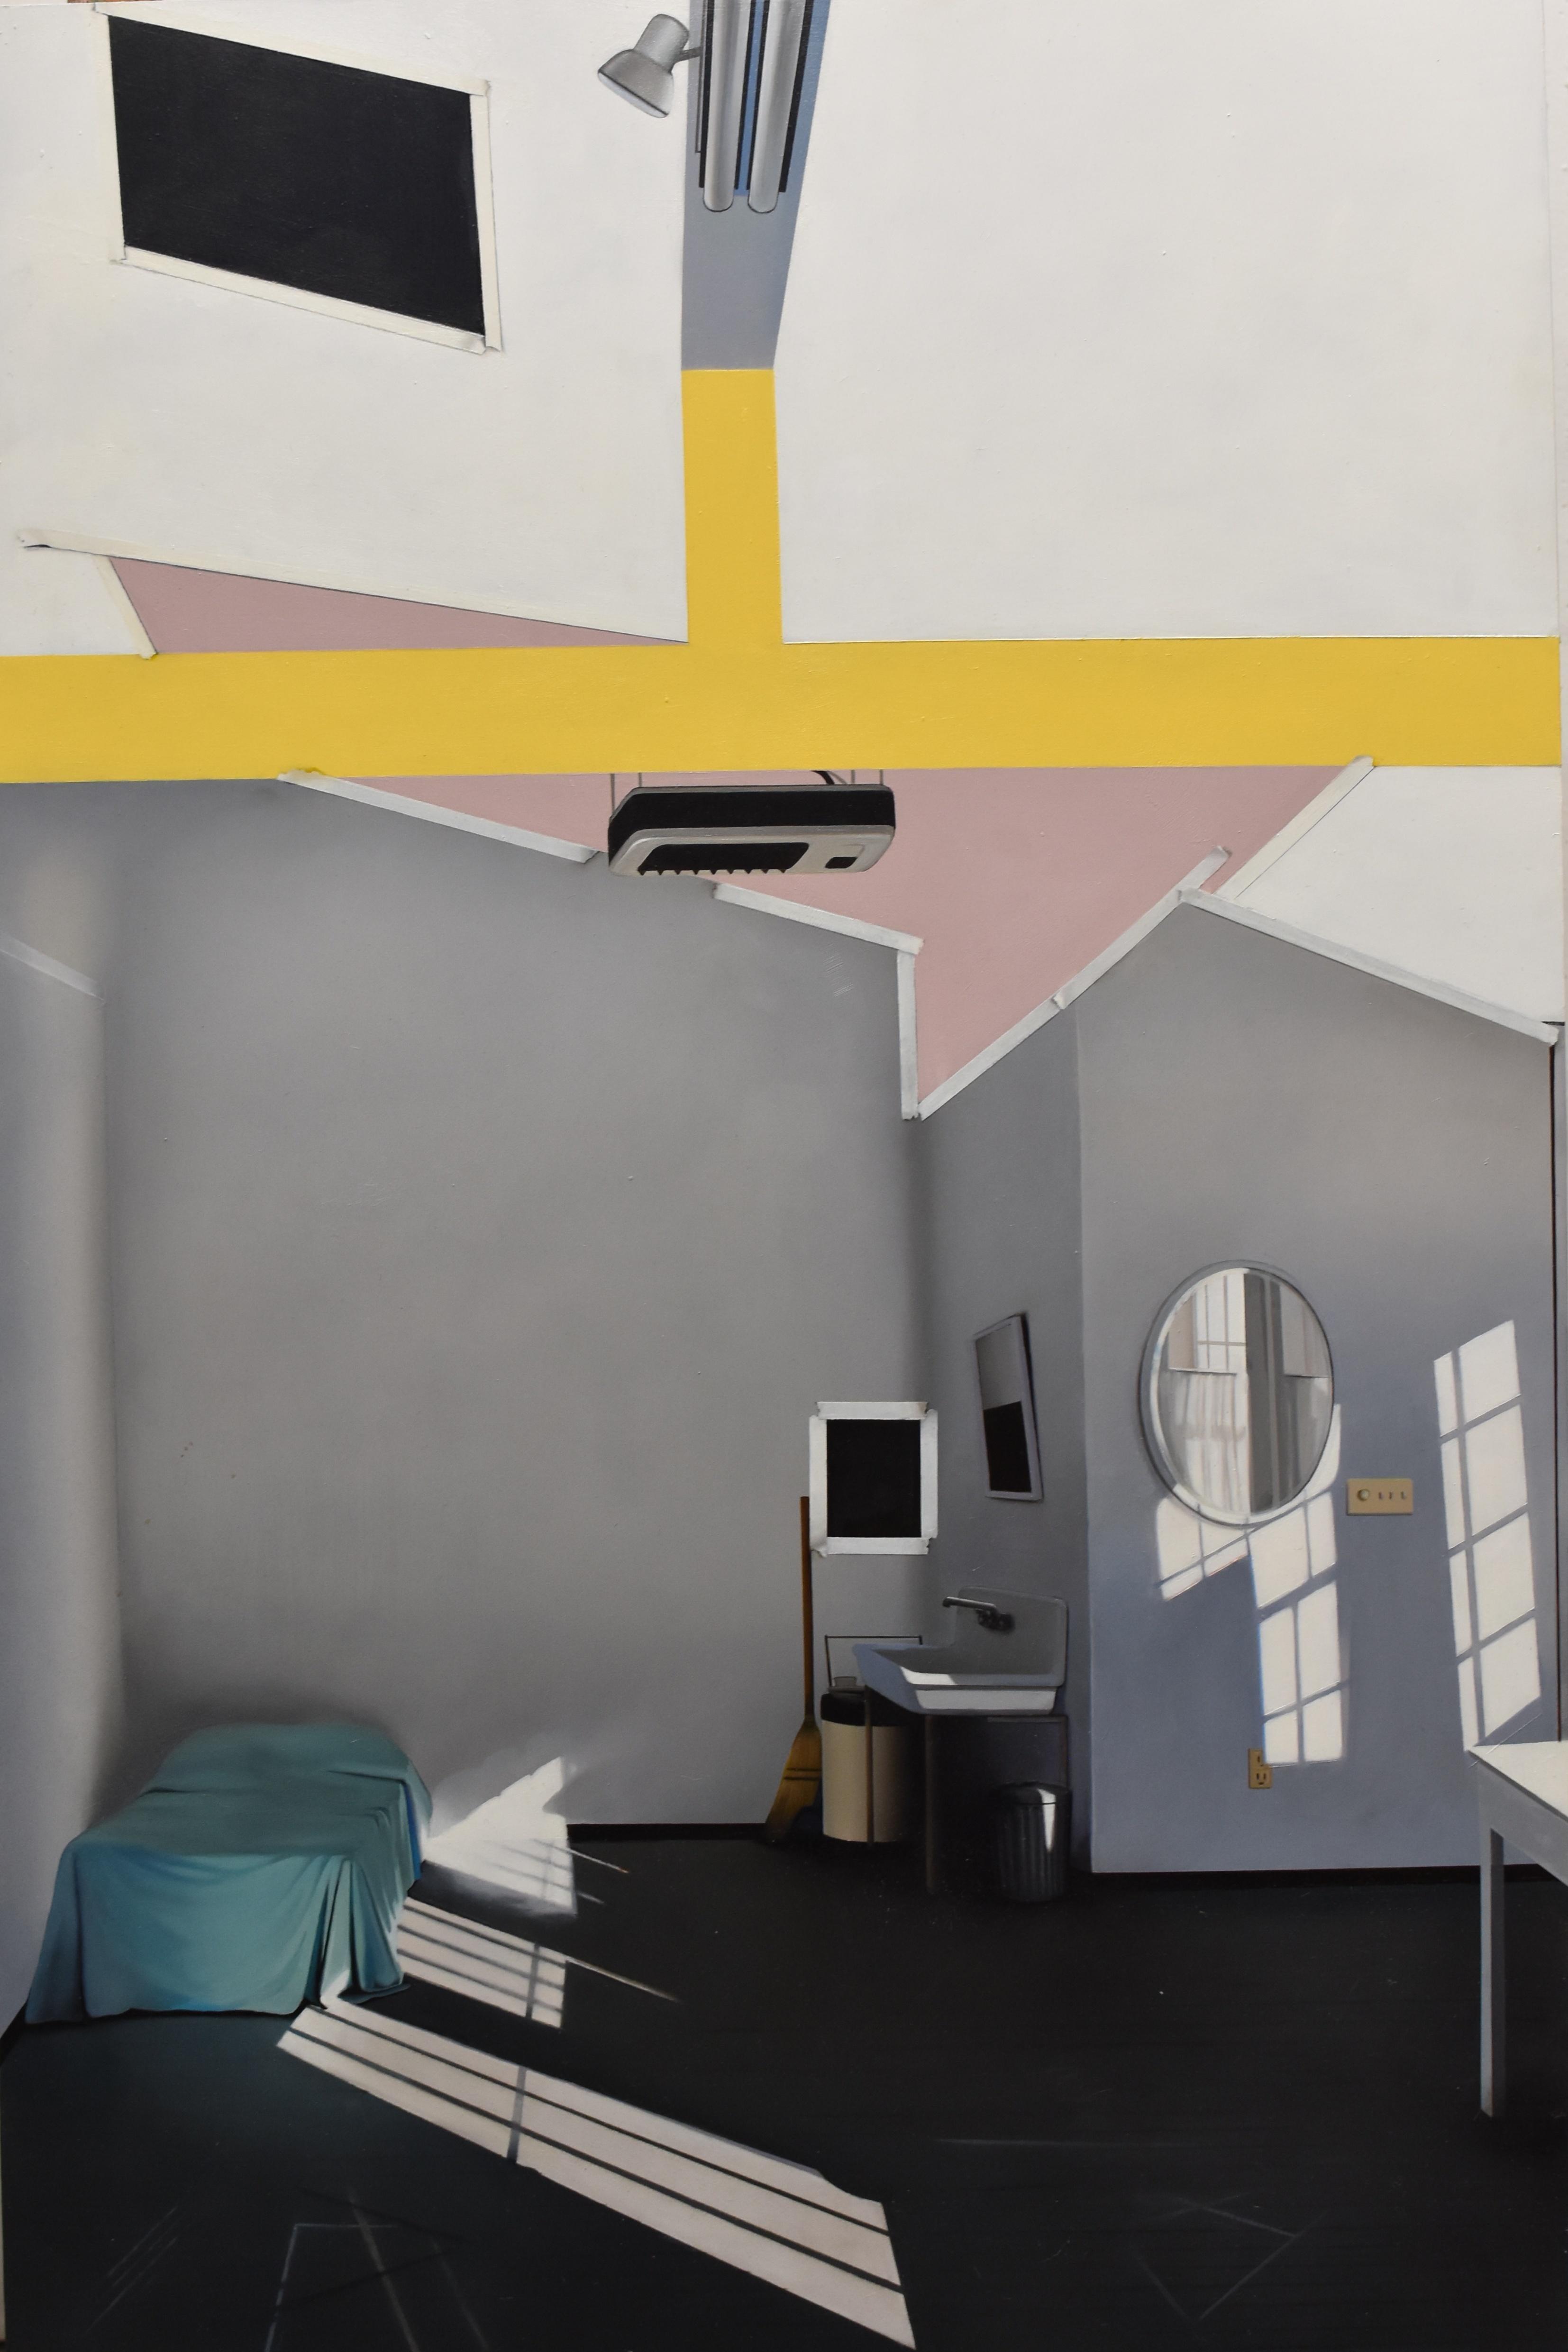 Stone Barn North, realist interior oil painting, 2013